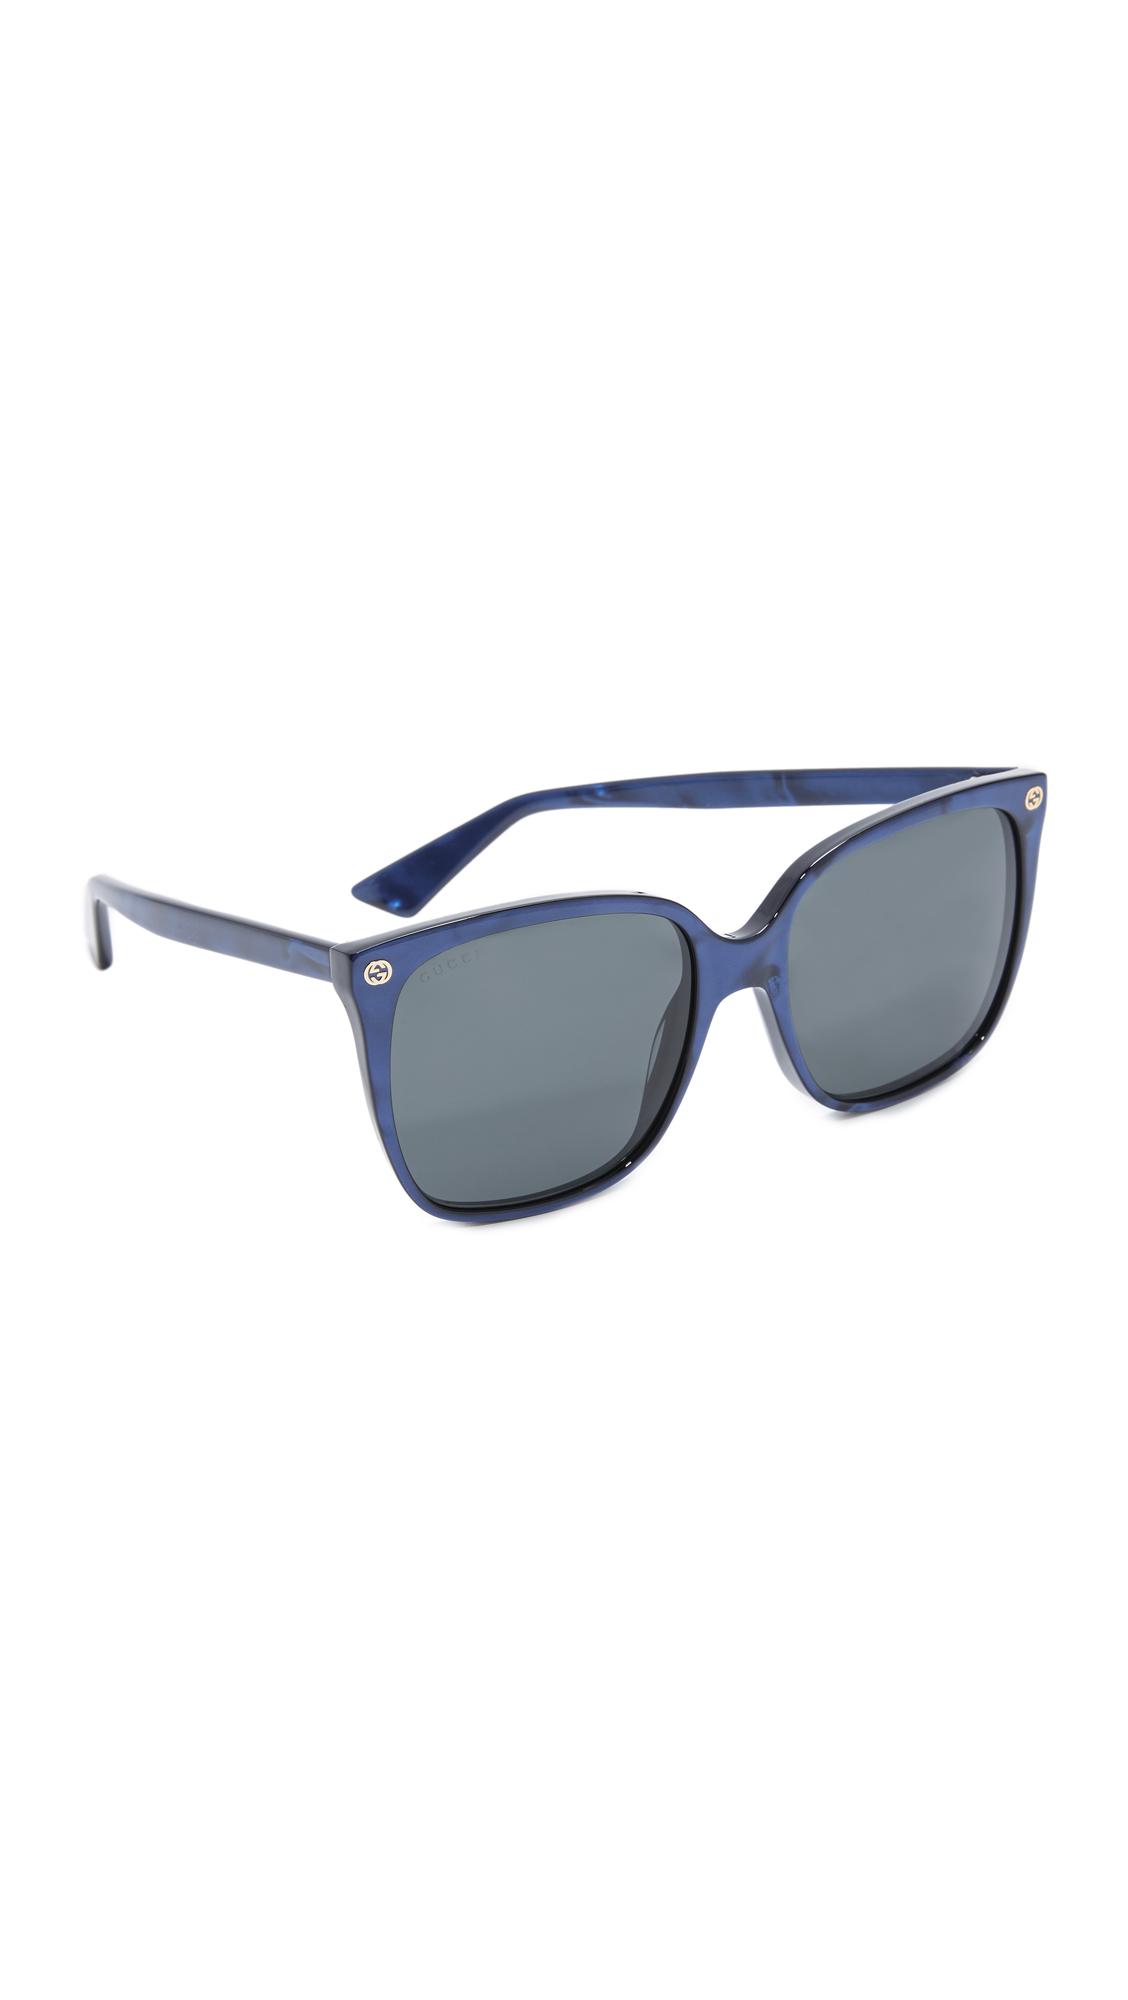 Gucci Lightness Square Sunglasses - Pearled Blue/Gray at Shopbop